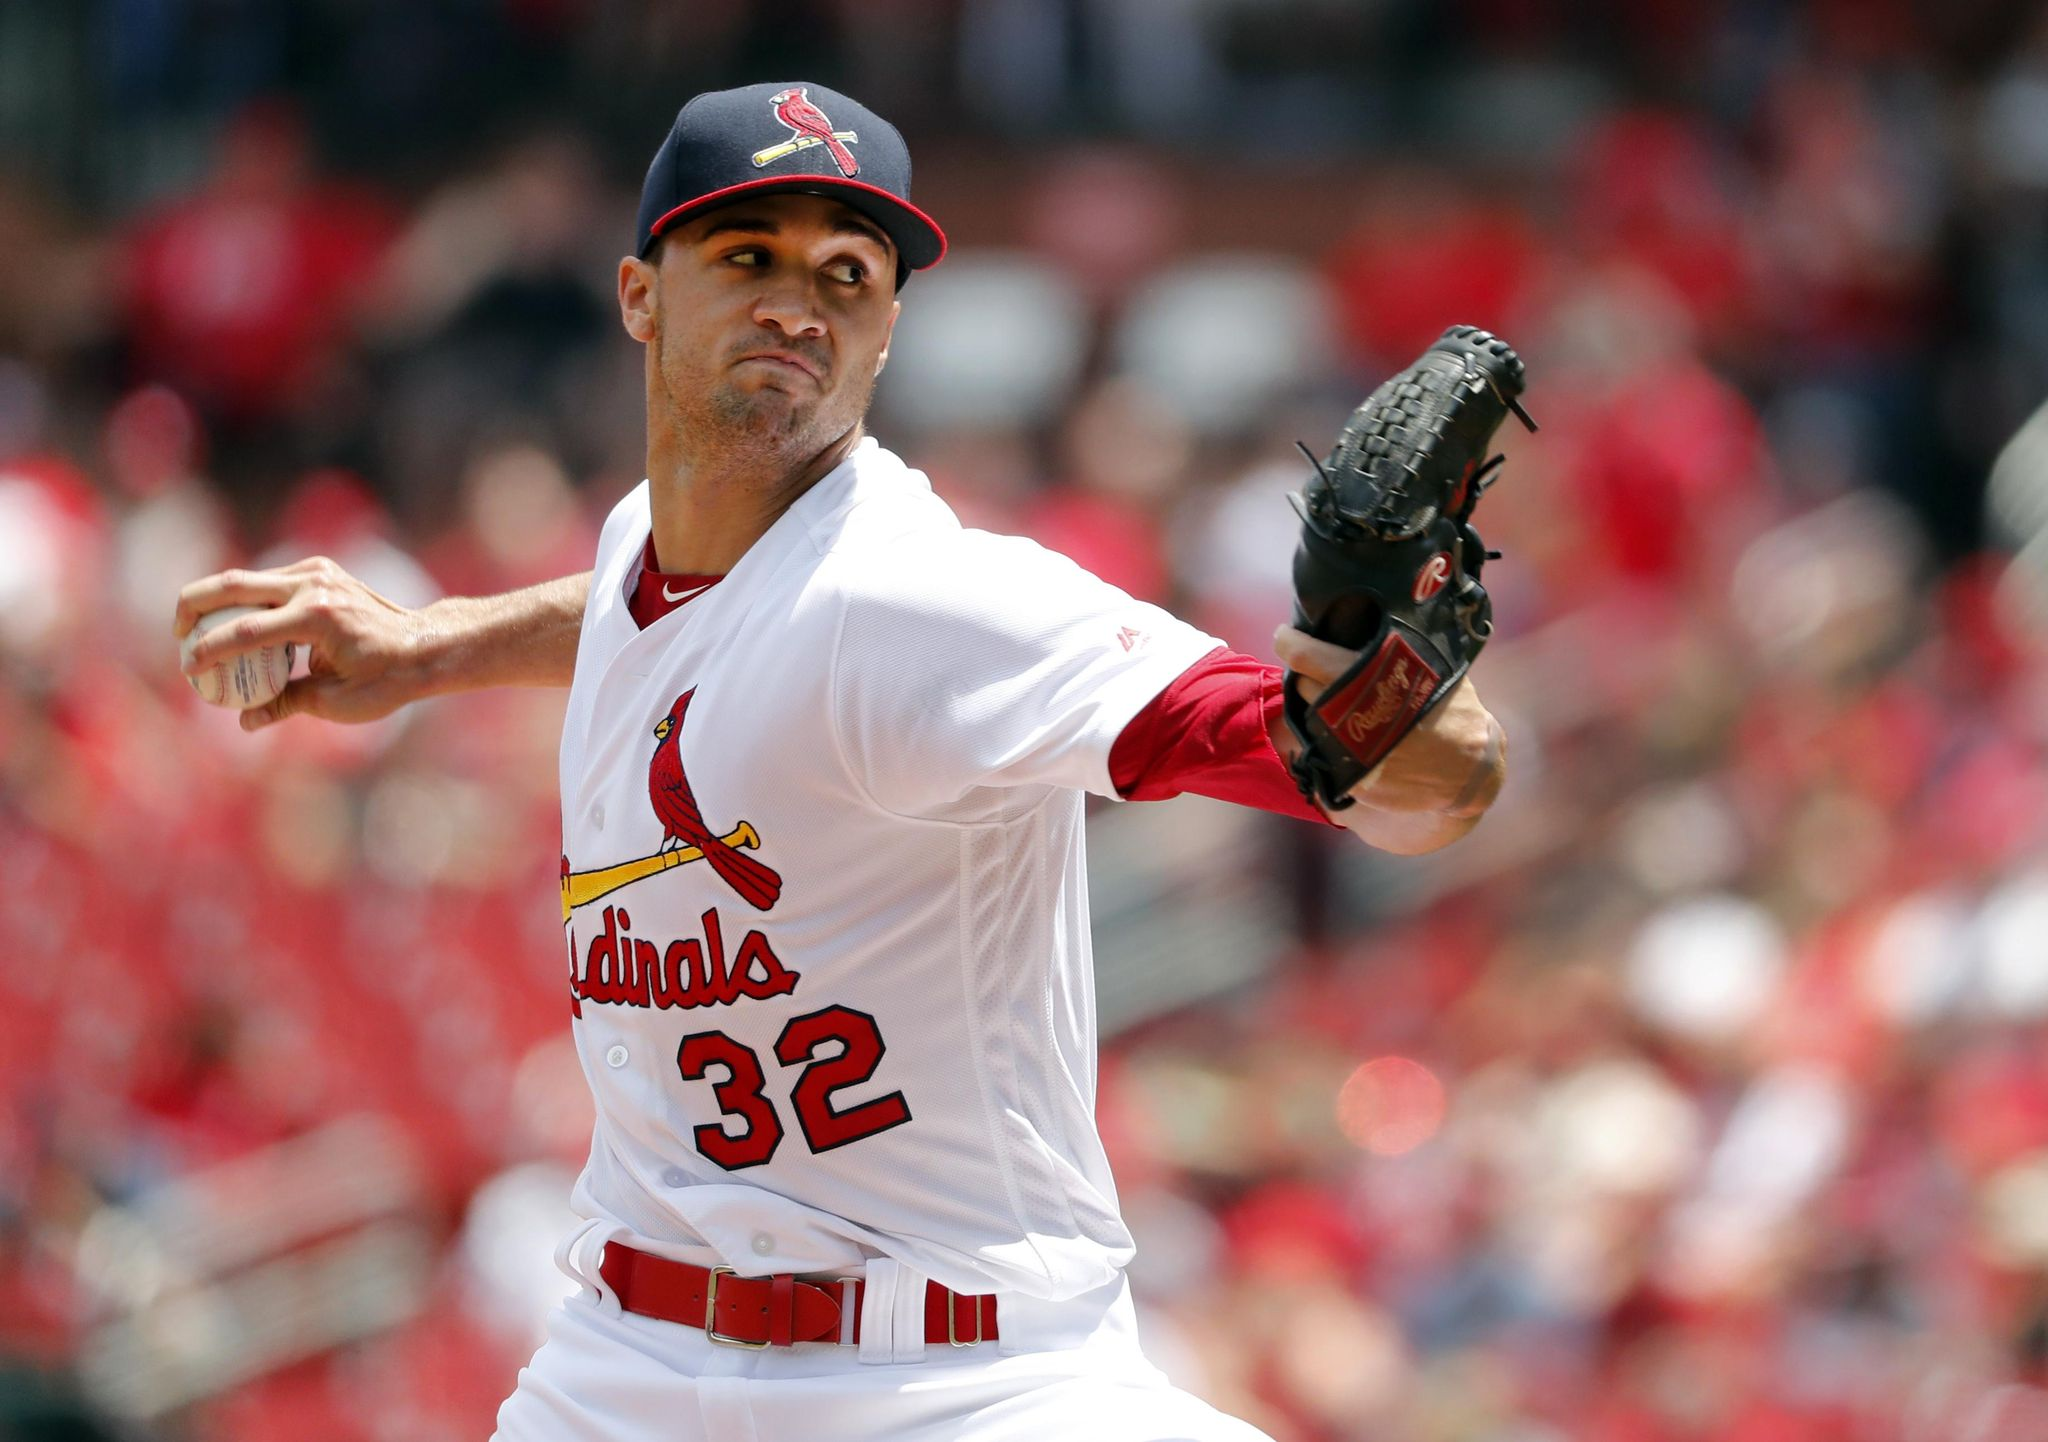 Phillies_cardinals_baseball_38976_s2048x1442